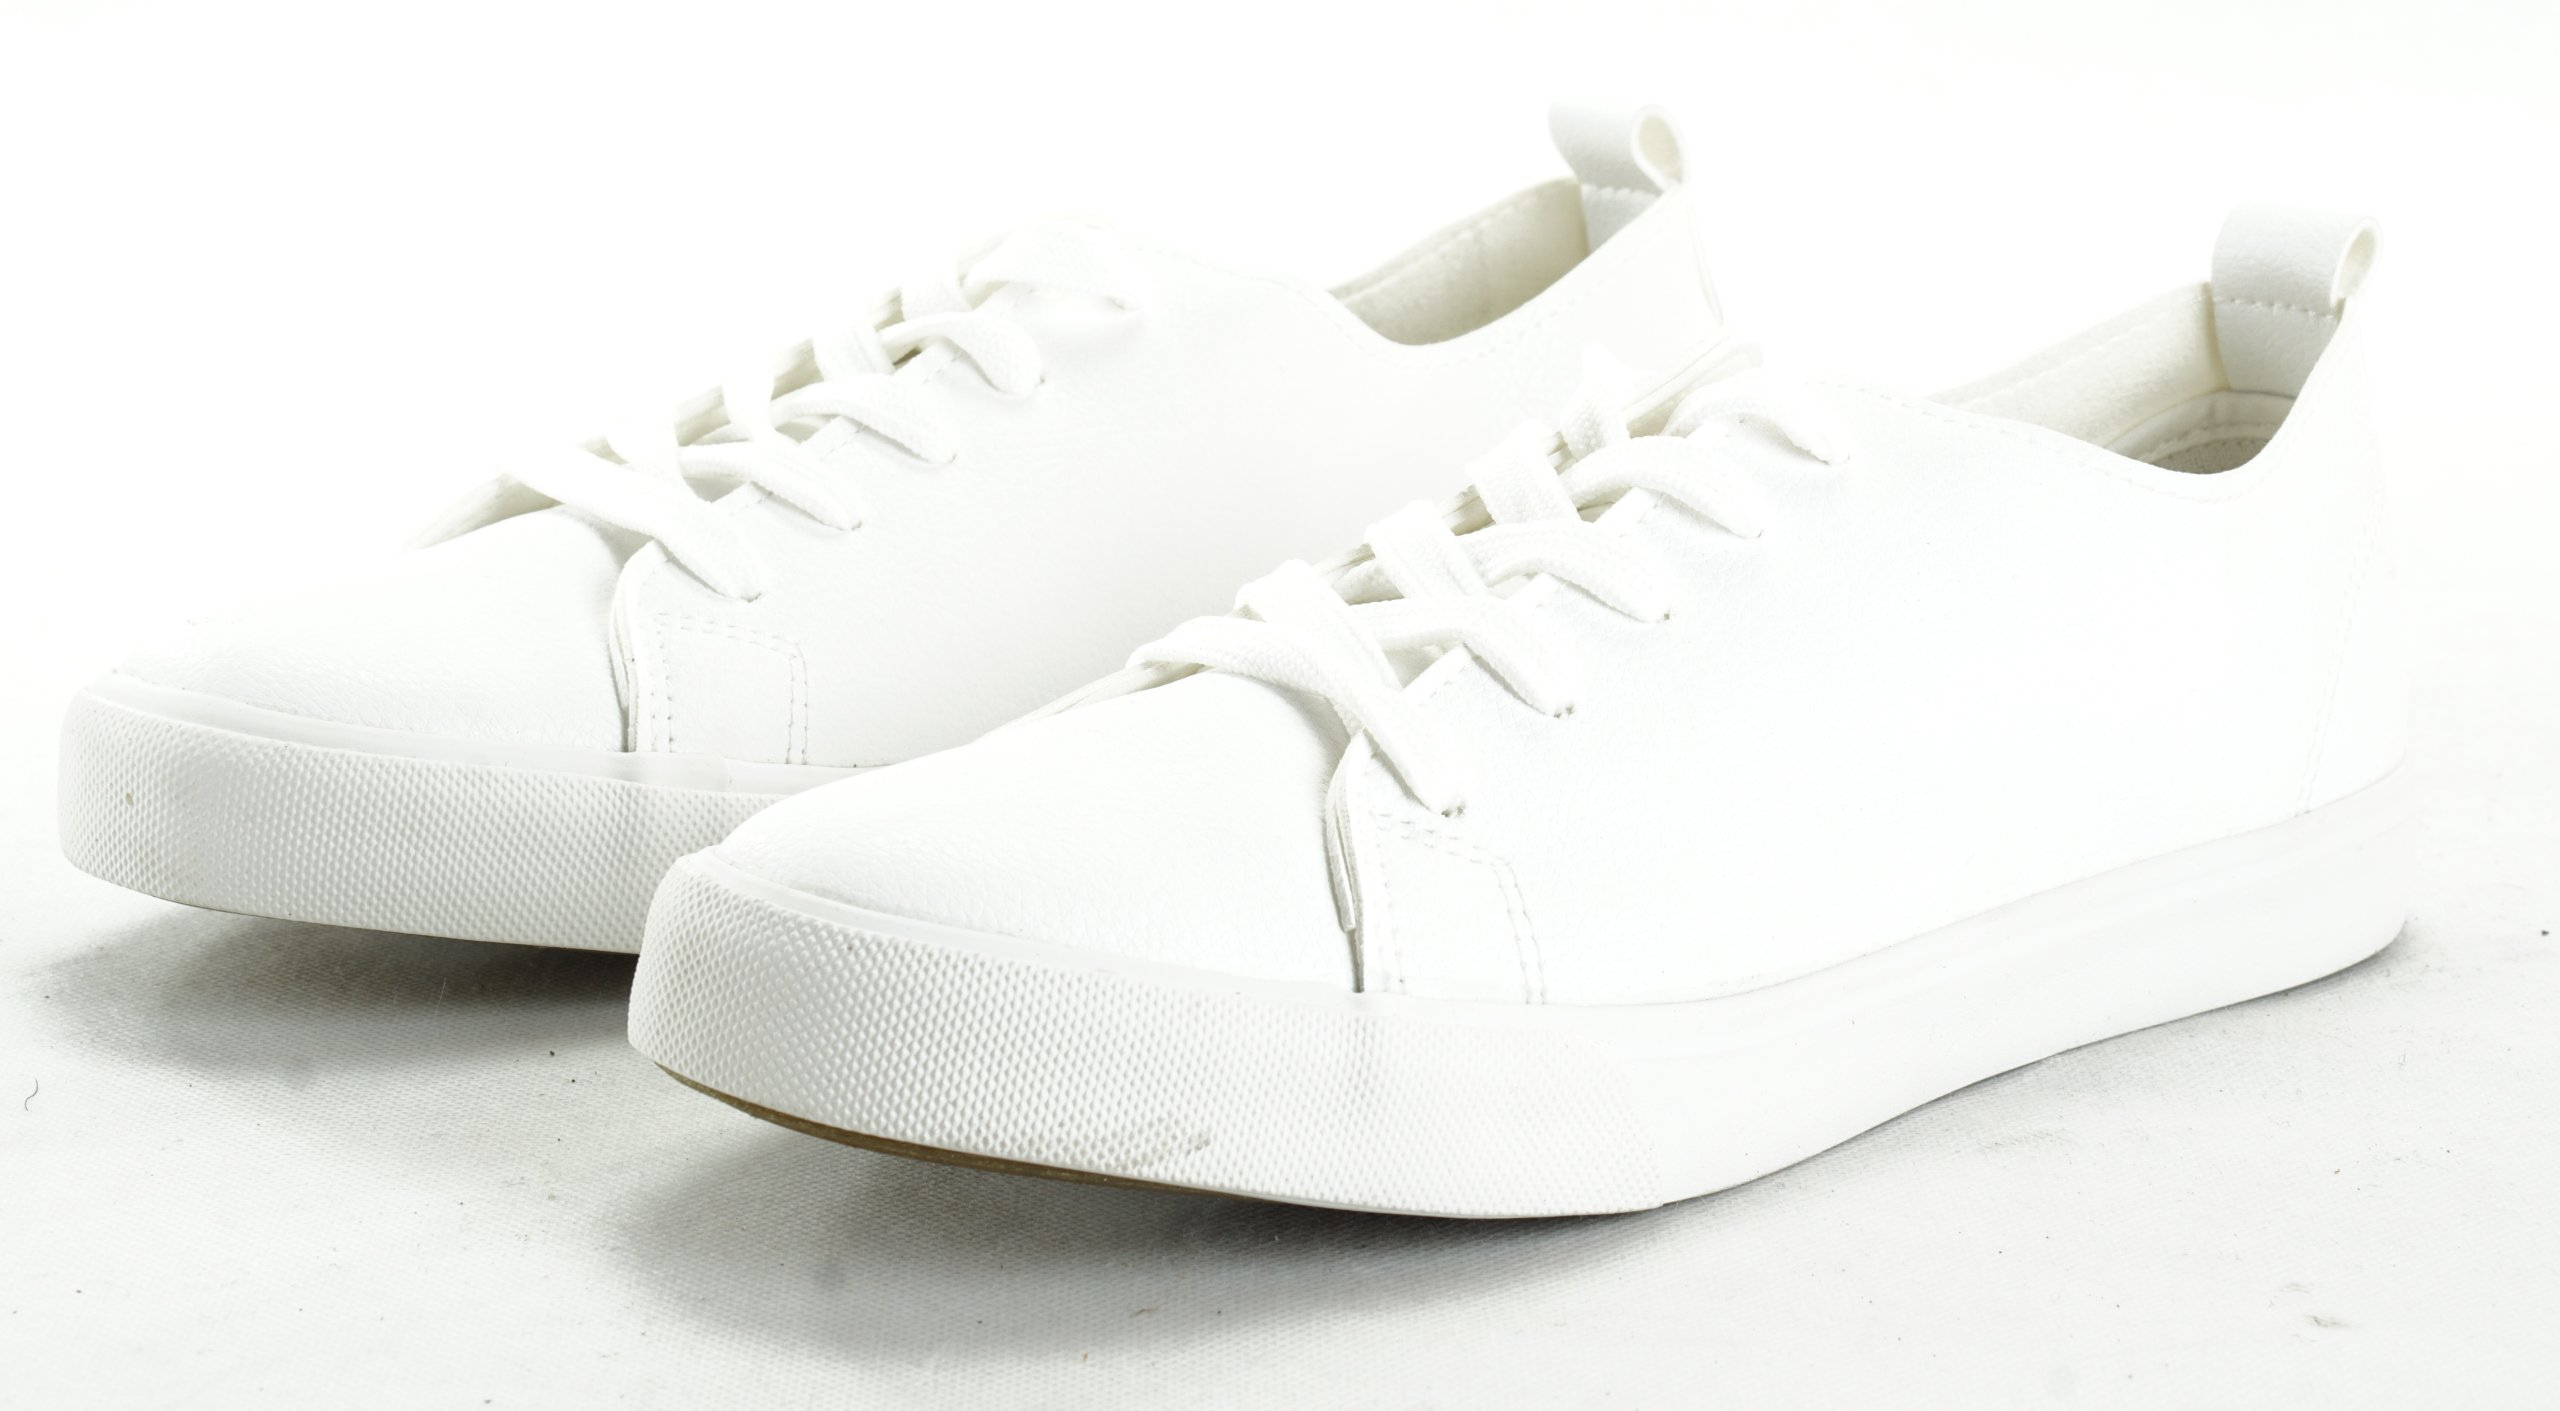 f1f289ed1a56f NEW LOOK białe niskie wiązane damskie 8 41 D8 10 - 7183265368 ...